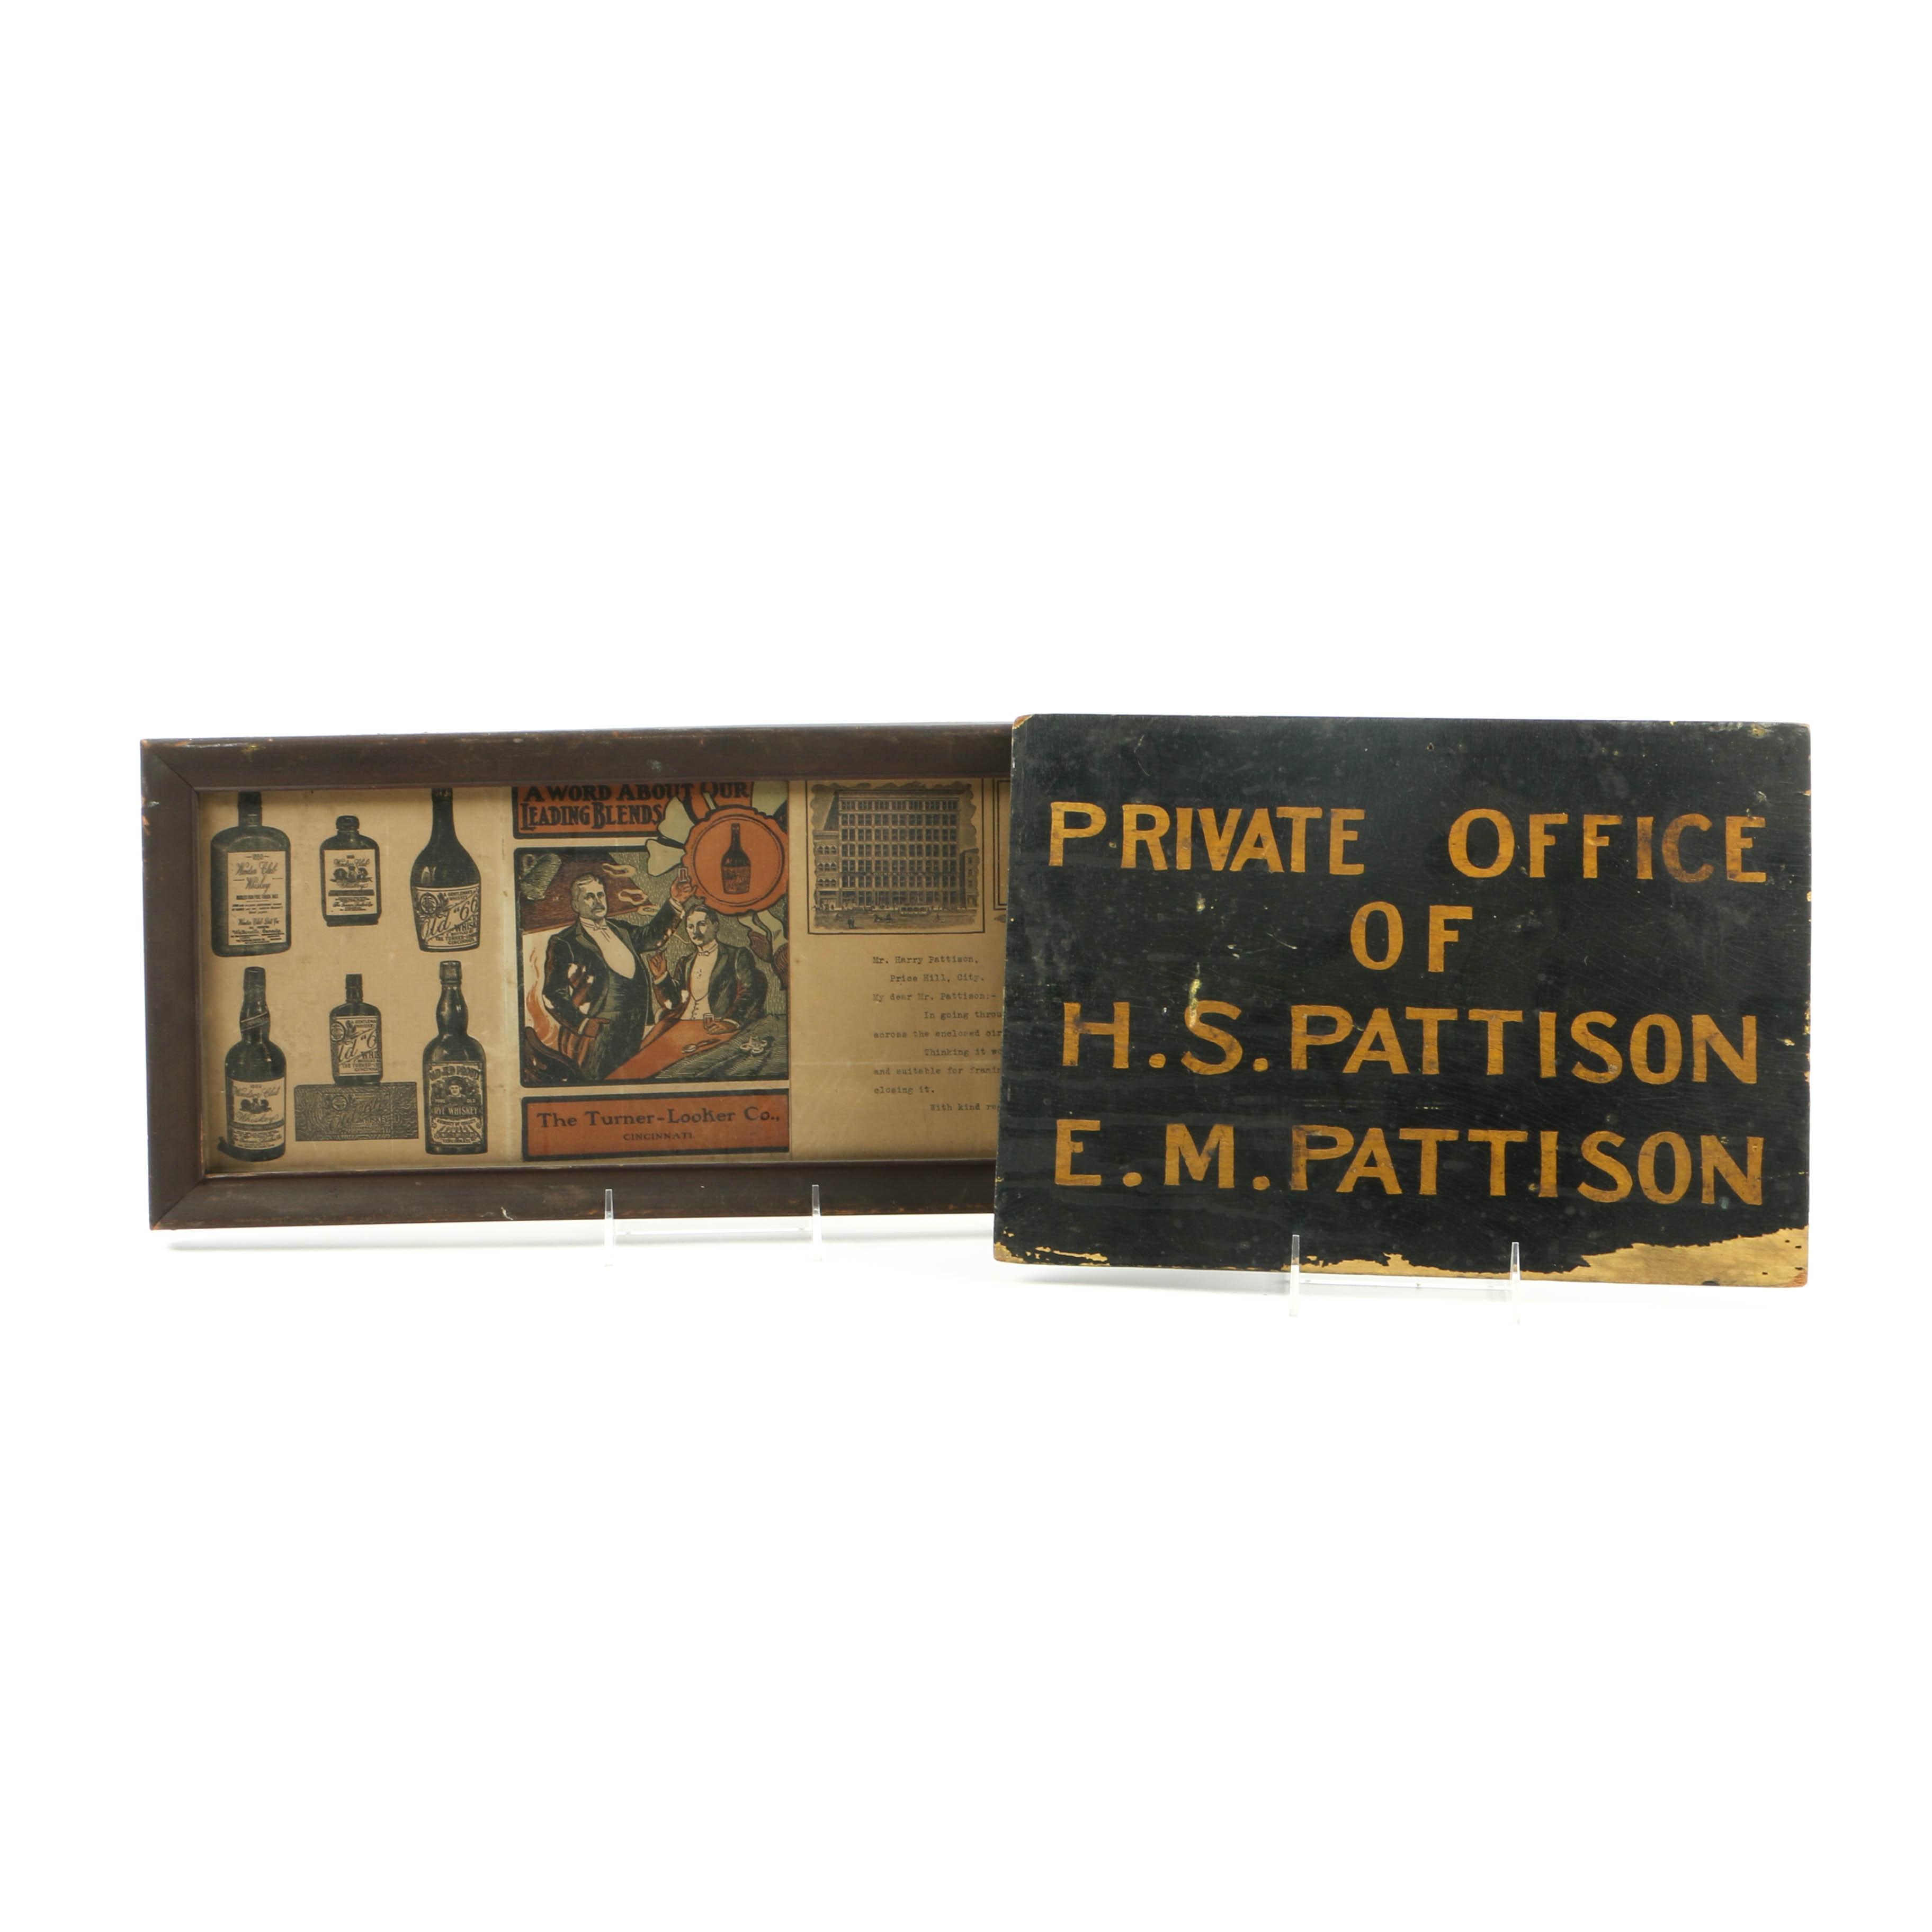 Antique Ephemera Belonging to Cincinnati Distillery Magnate Harry S. Pattison